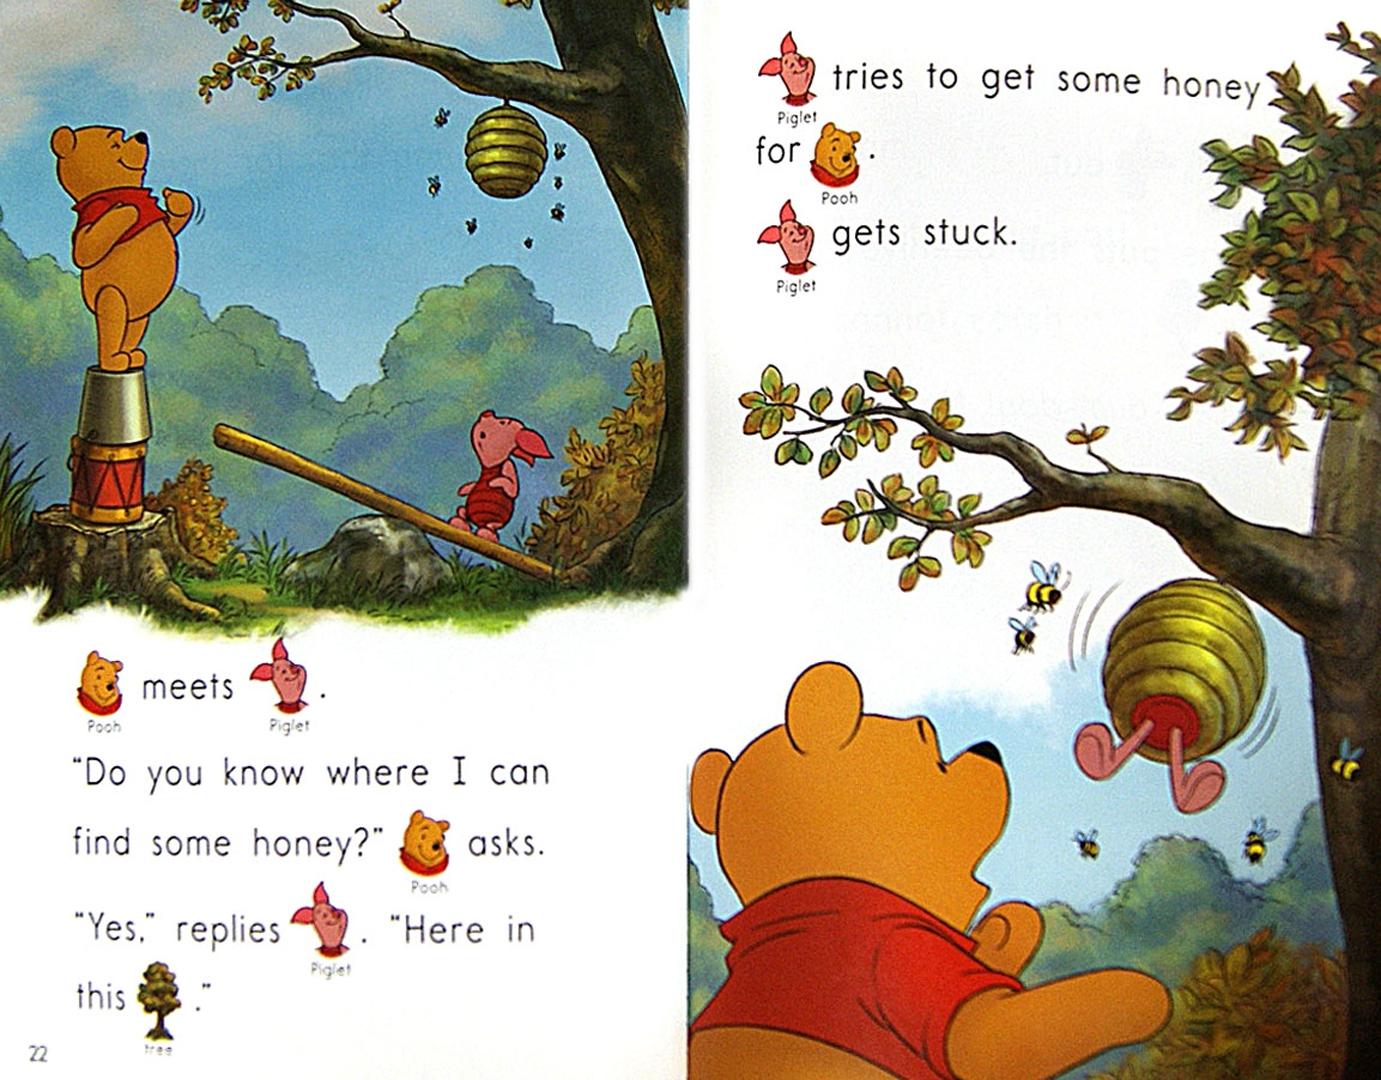 Иллюстрация 1 из 2 для Winnie the Pooh: Pooh's Honey Adventure - Lisa Marsoli   Лабиринт - книги. Источник: Лабиринт